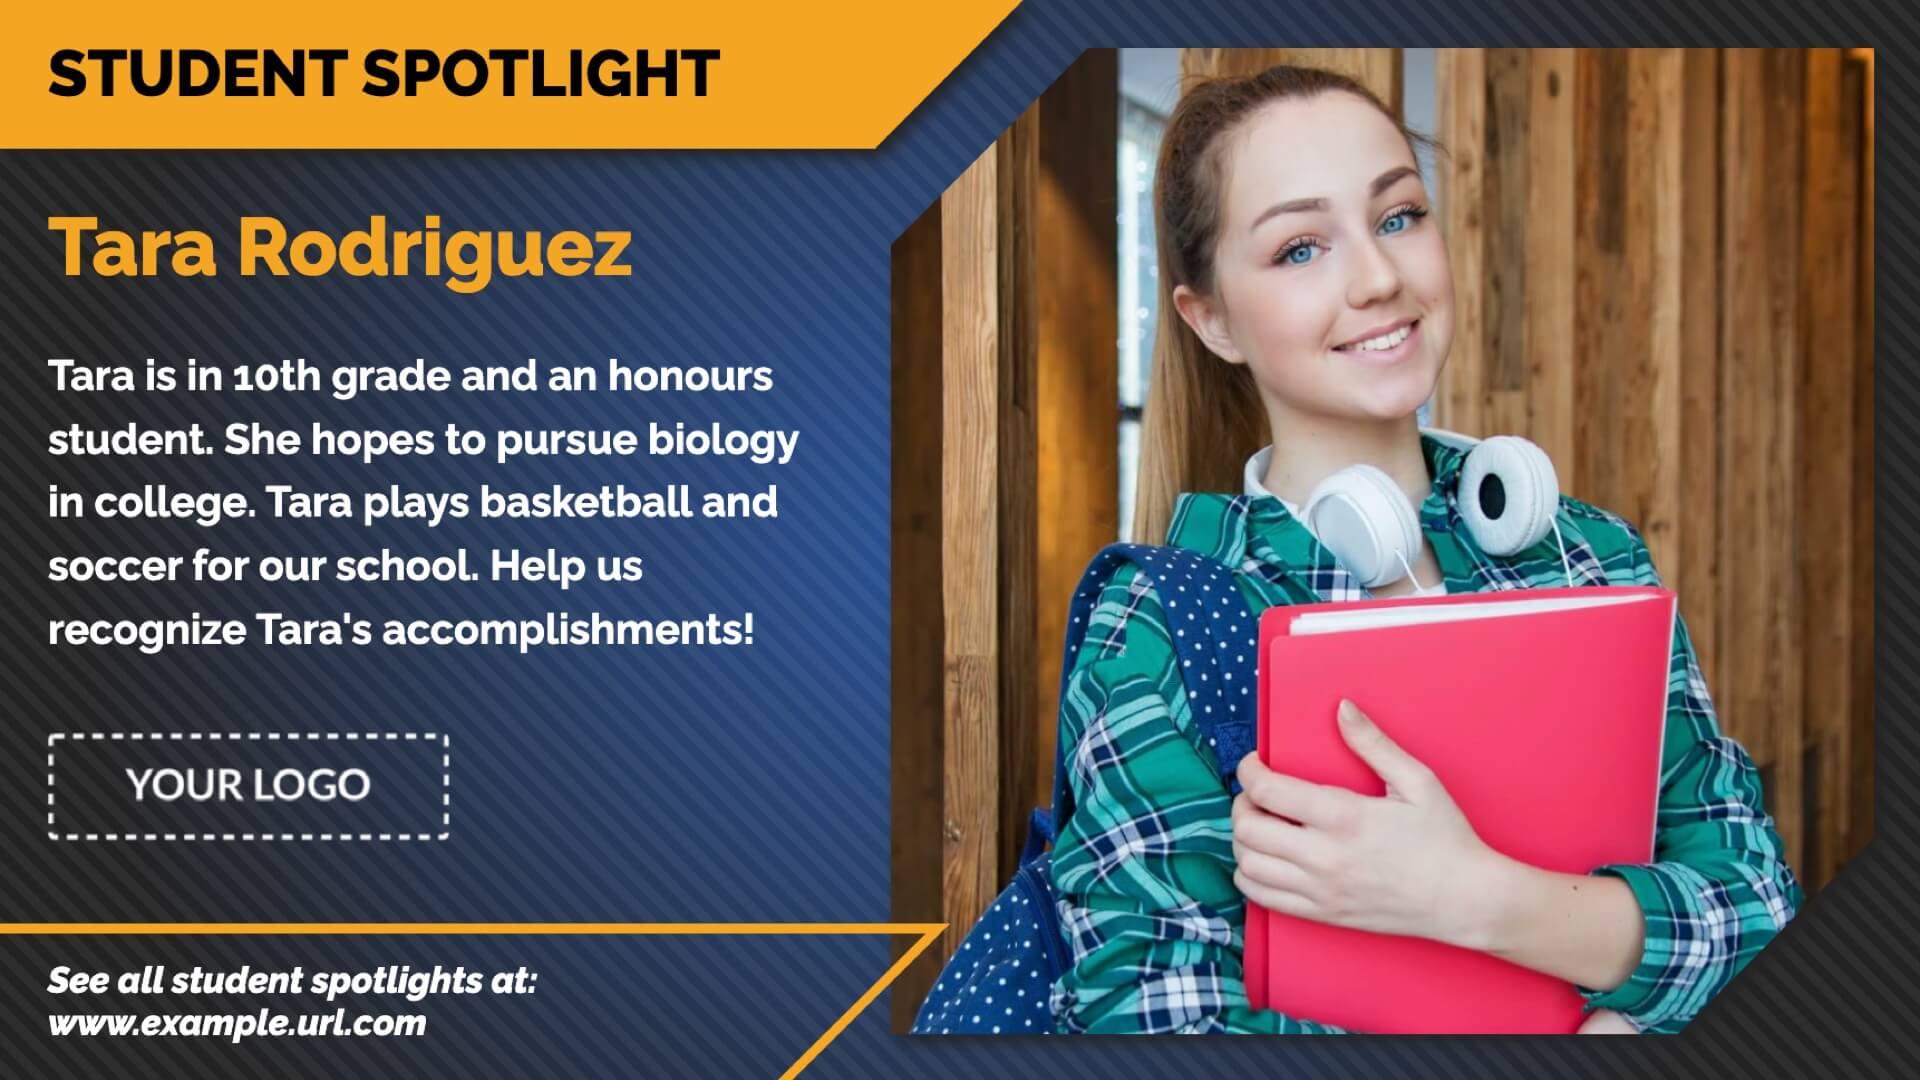 Student Spotlight Text & Image Digital Signage Template